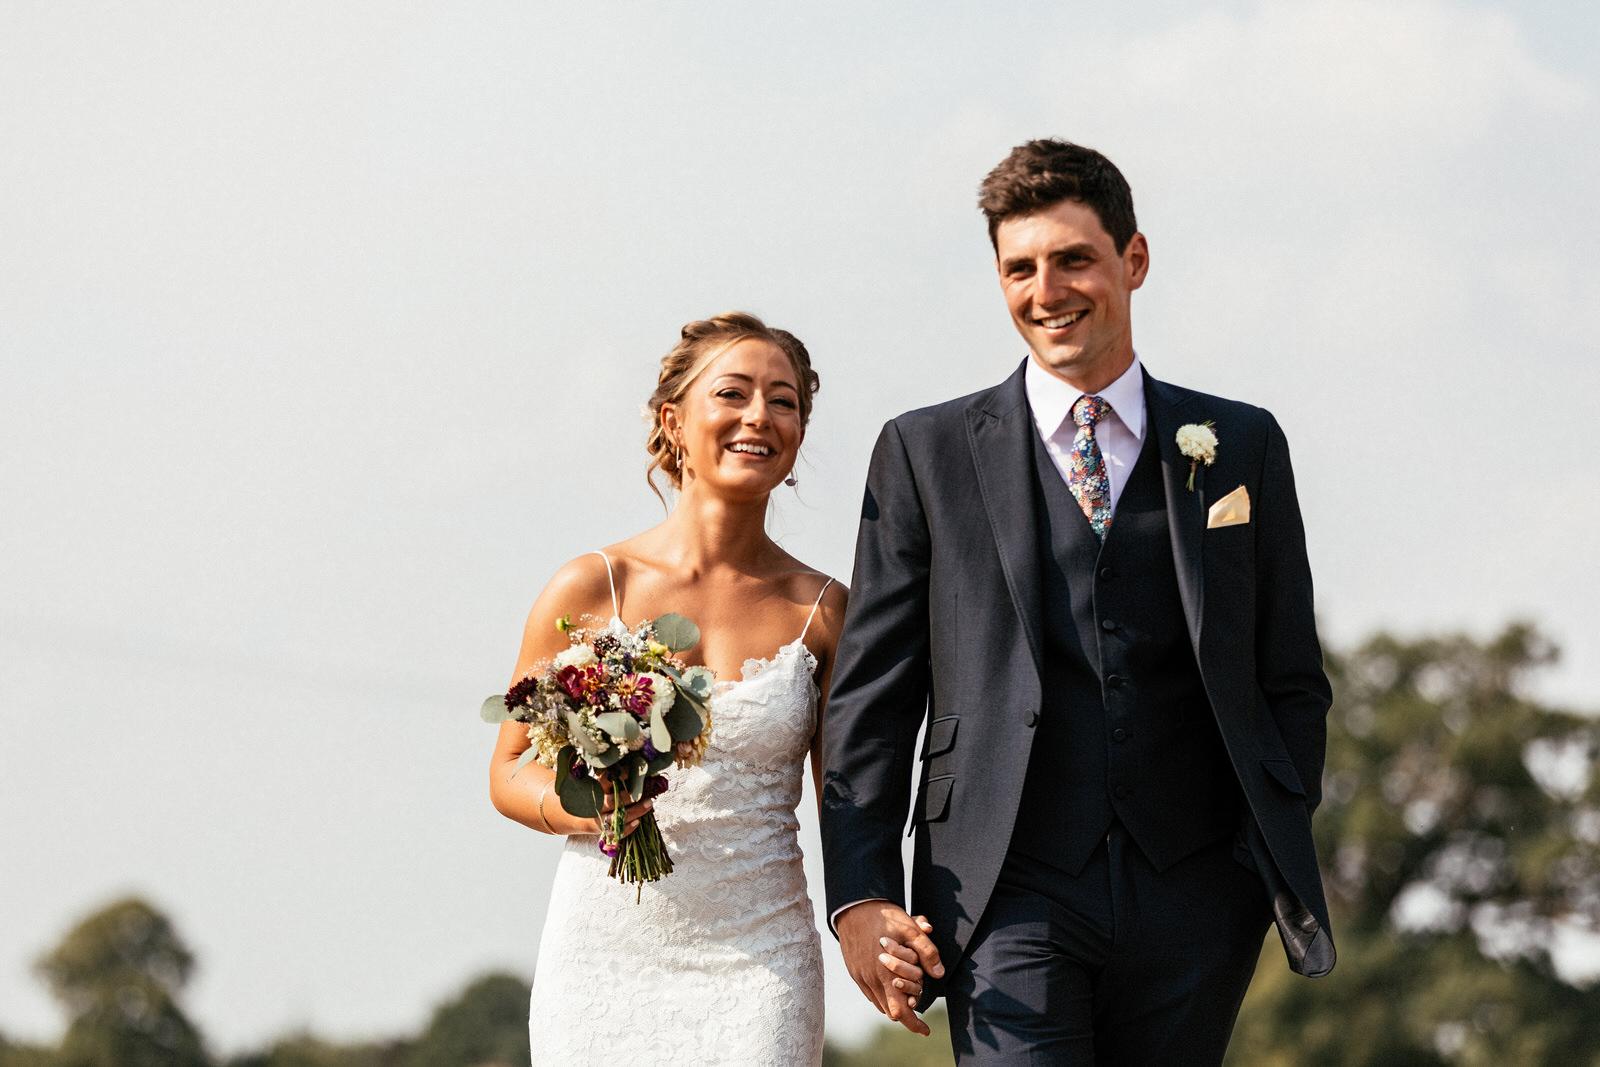 Edworth-Manor-Farm-Wedding-Photographer-053.jpg